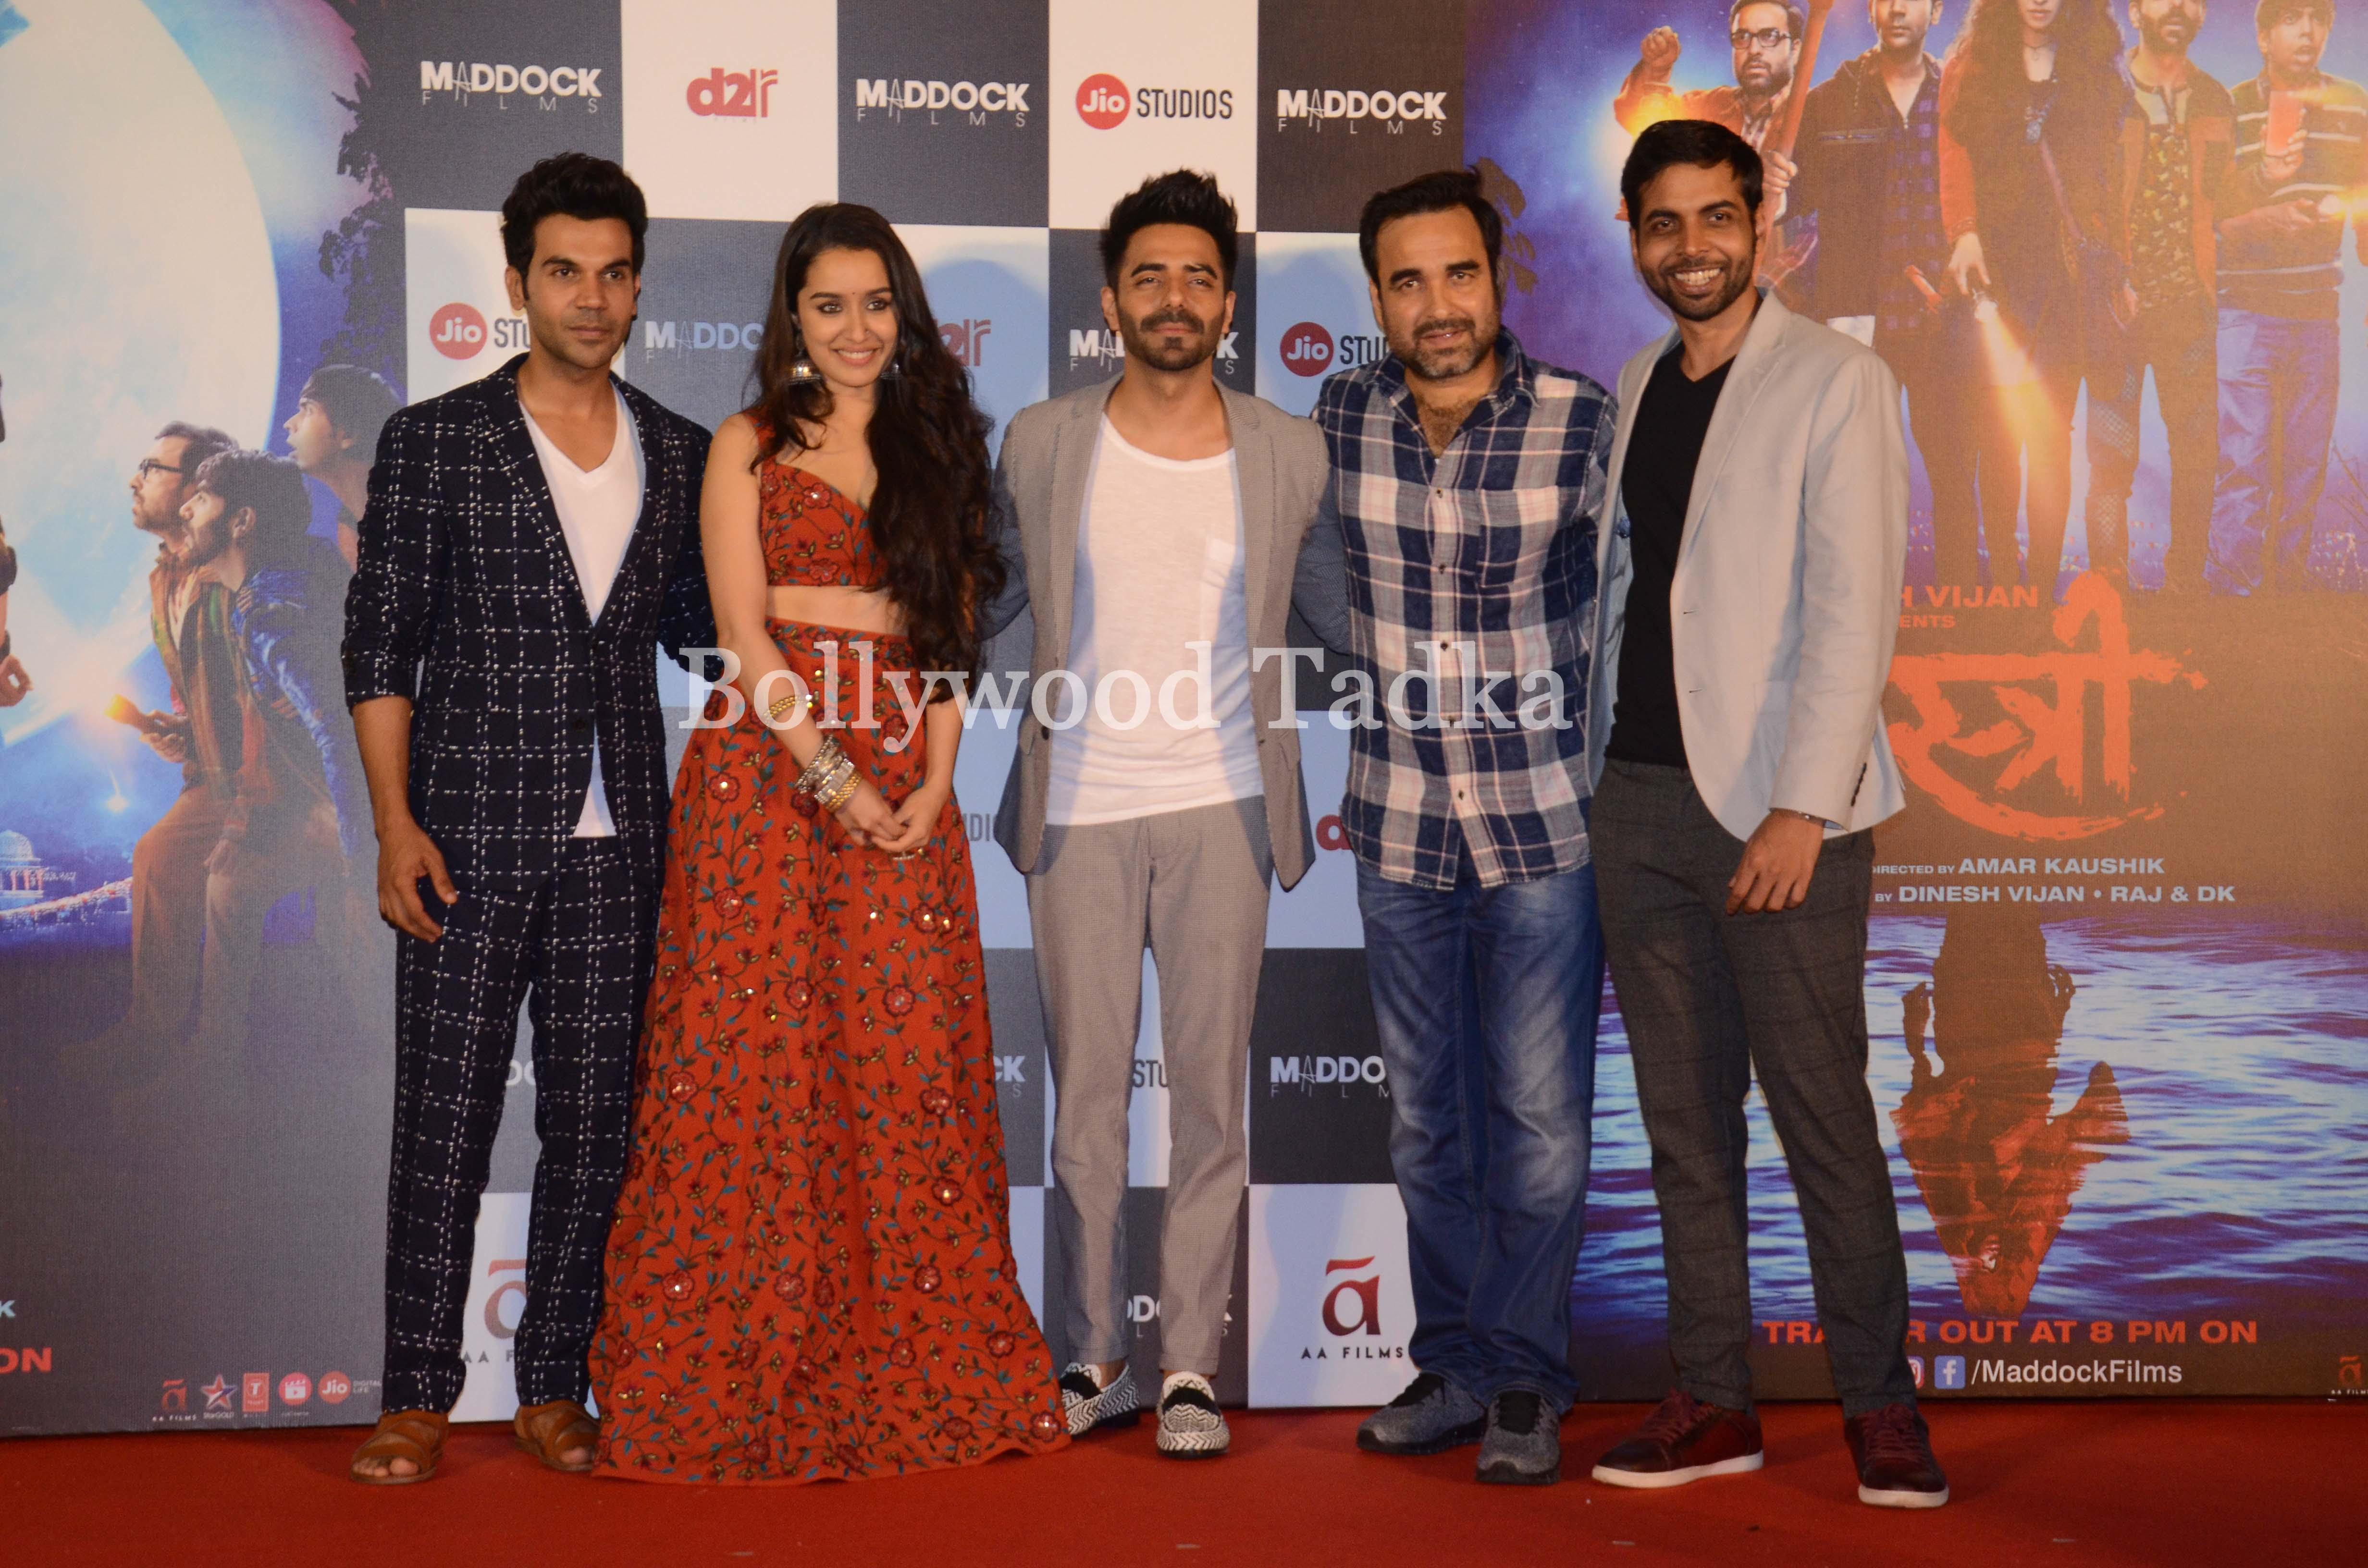 Bollywood Tadka,shraddha kapoor image, raj kumar rao image, श्रद्धा कपूर इमेज, राज कुमार राओ इमेज